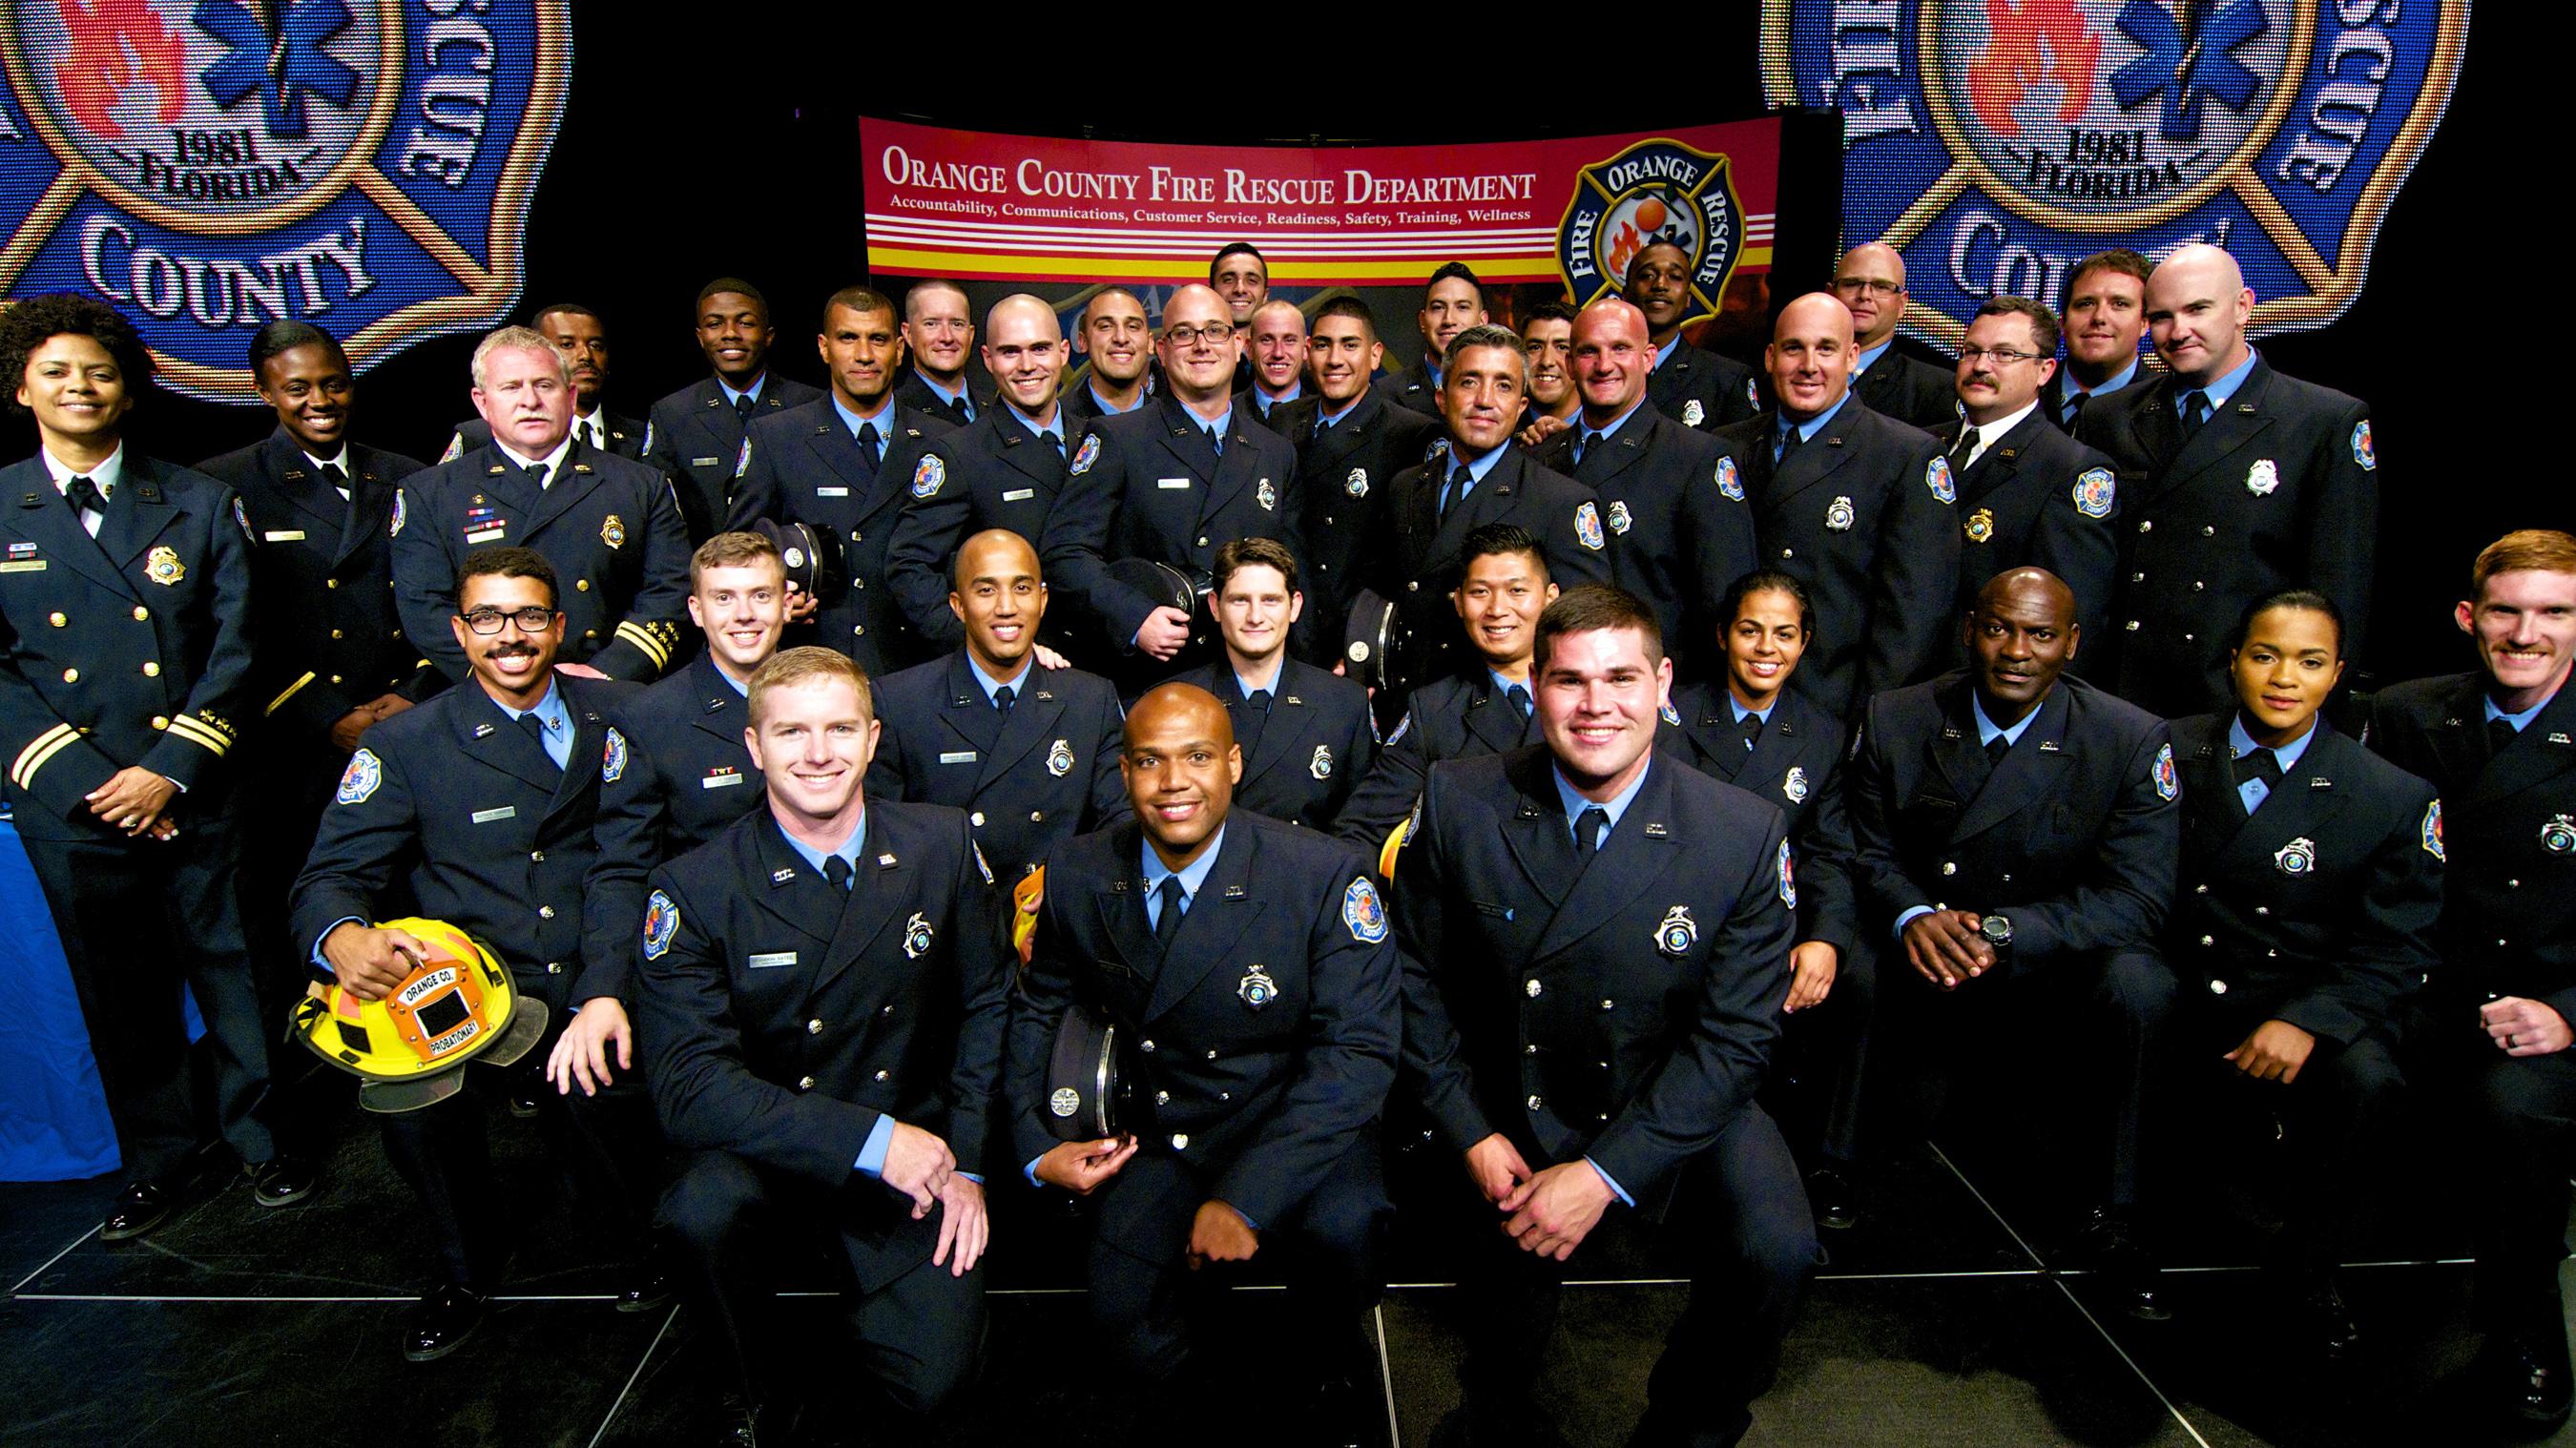 Orange County Fire Rescue Graduates New Recruit Class